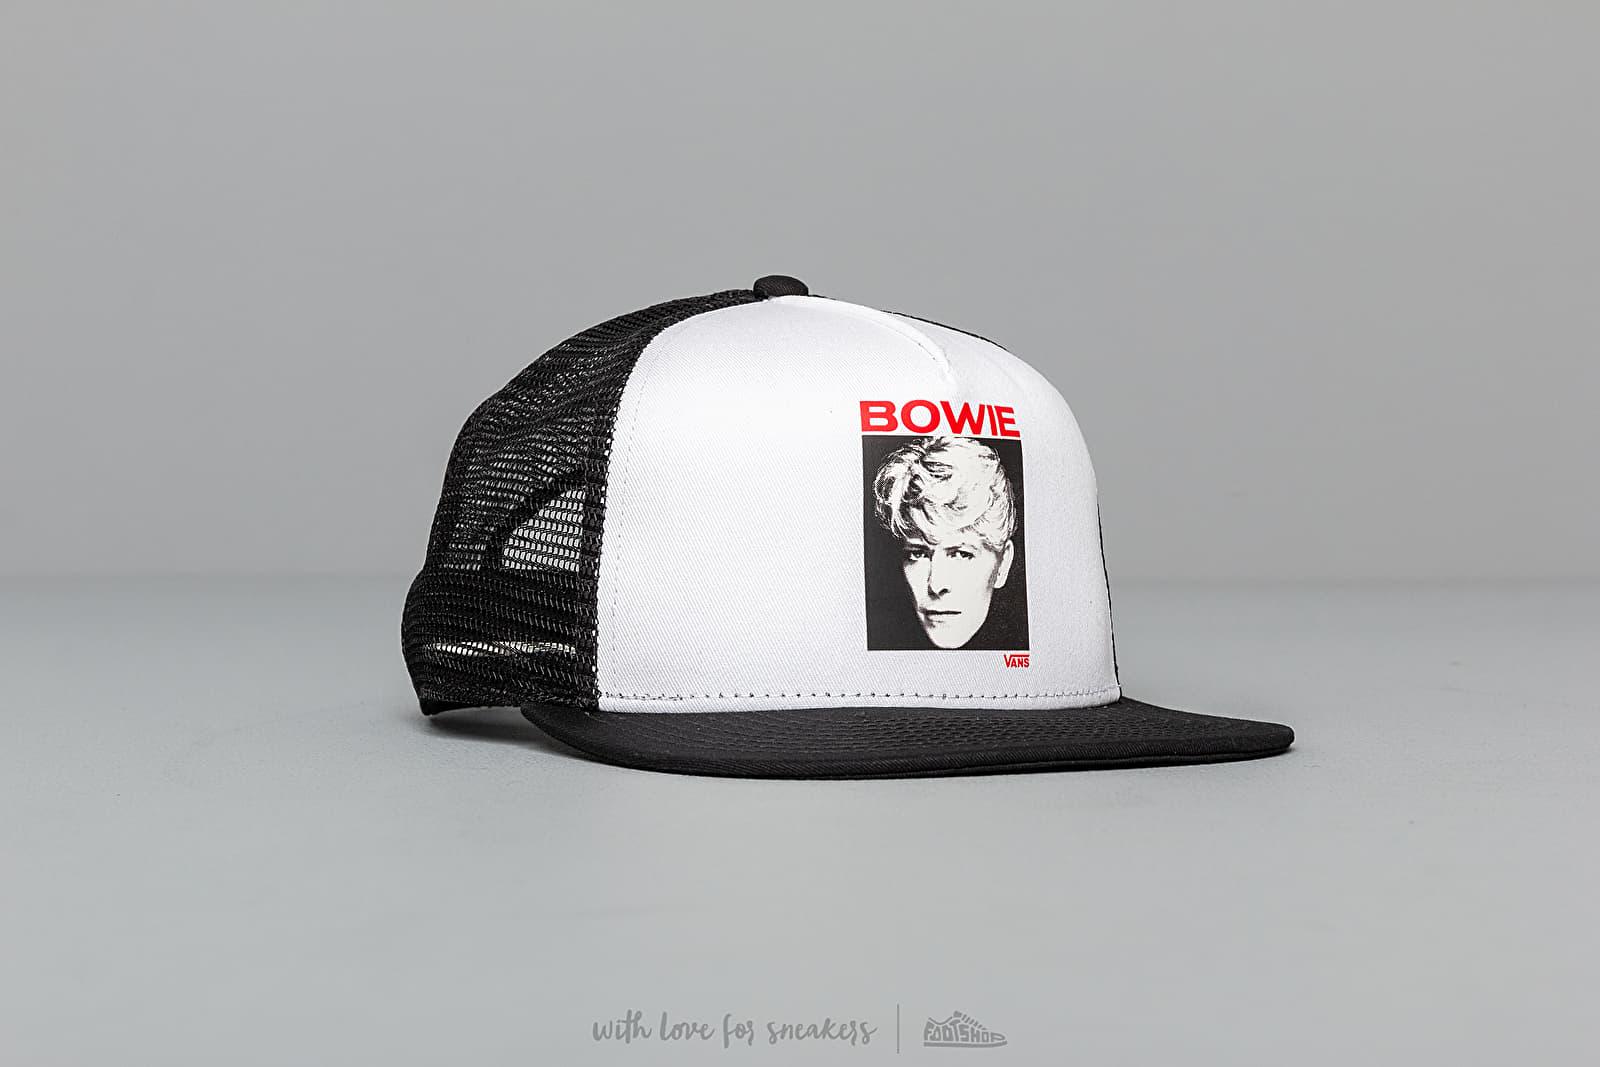 Vans David Bowie (Serious Moonlight) Trucker